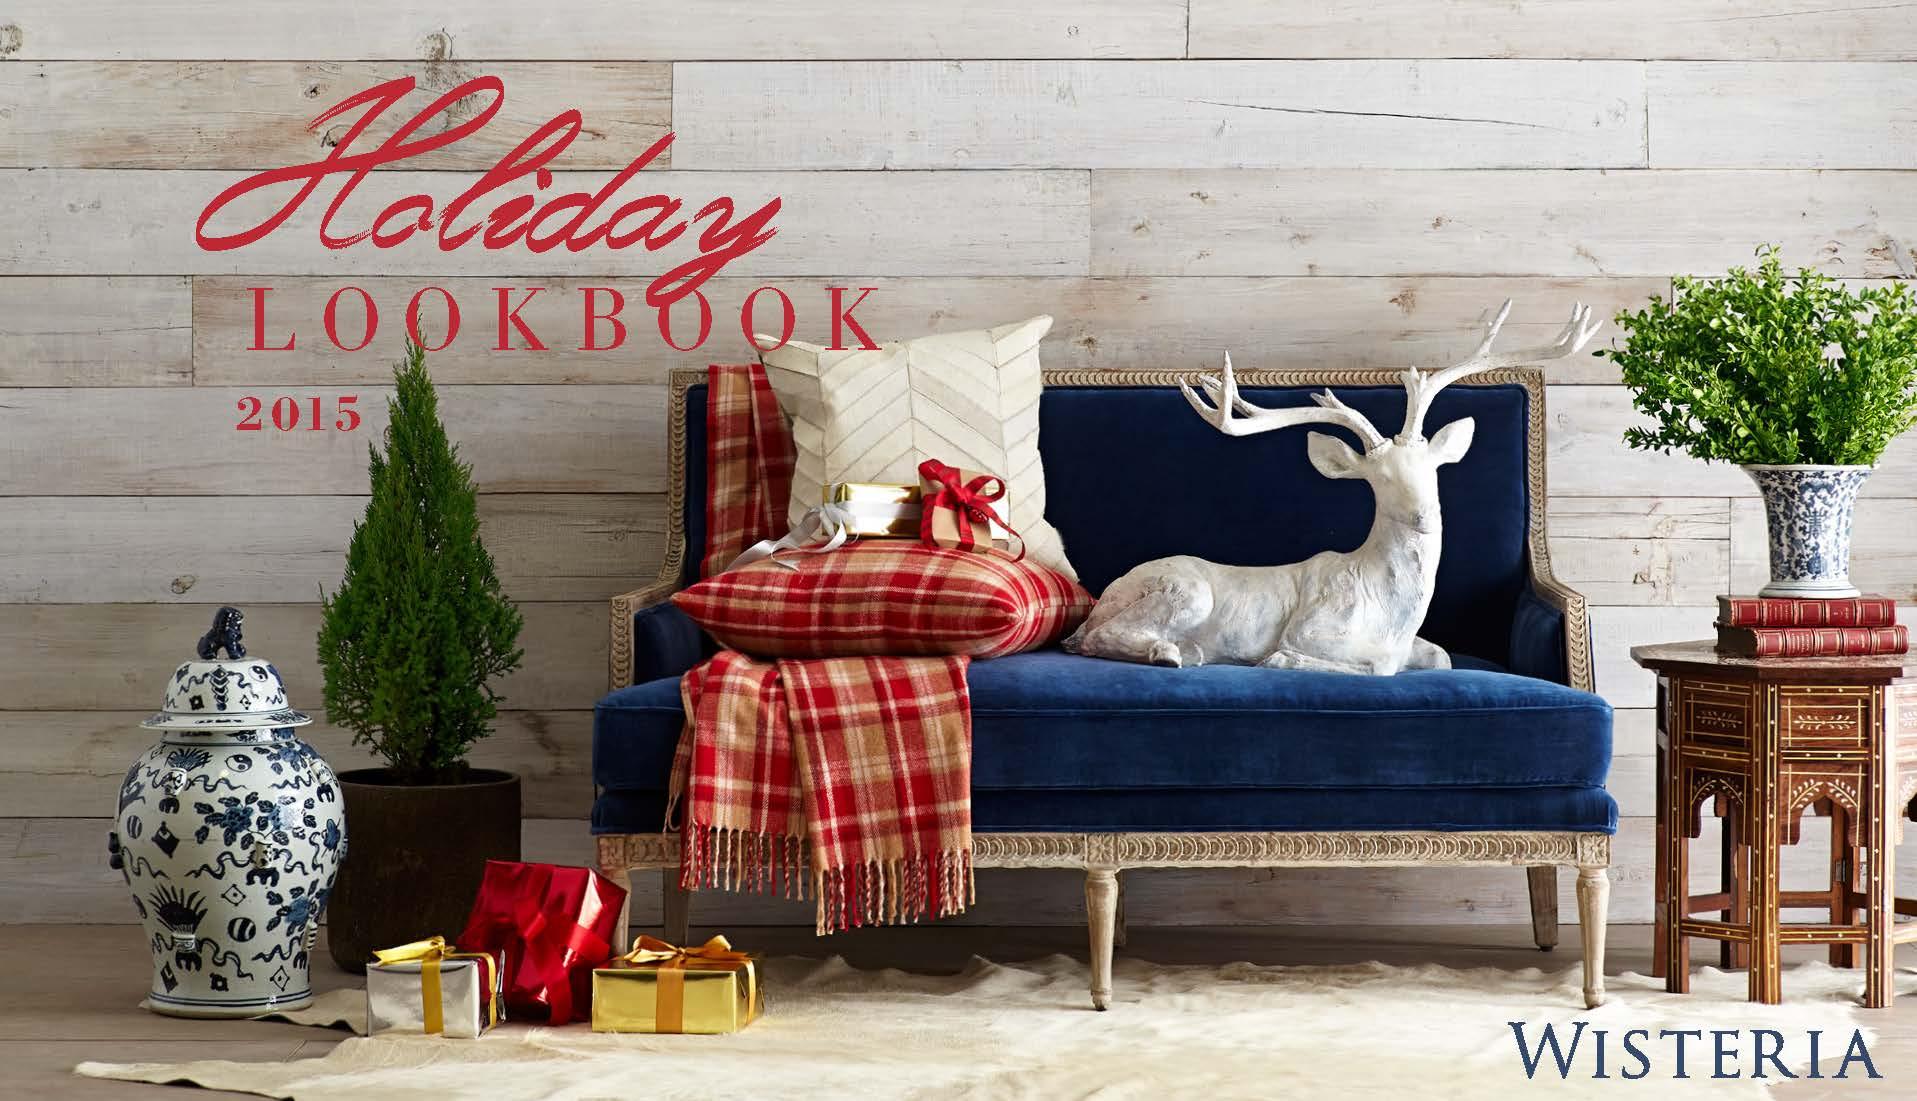 Wisteria-Holiday-Lookbook2015_Page_01.jpg